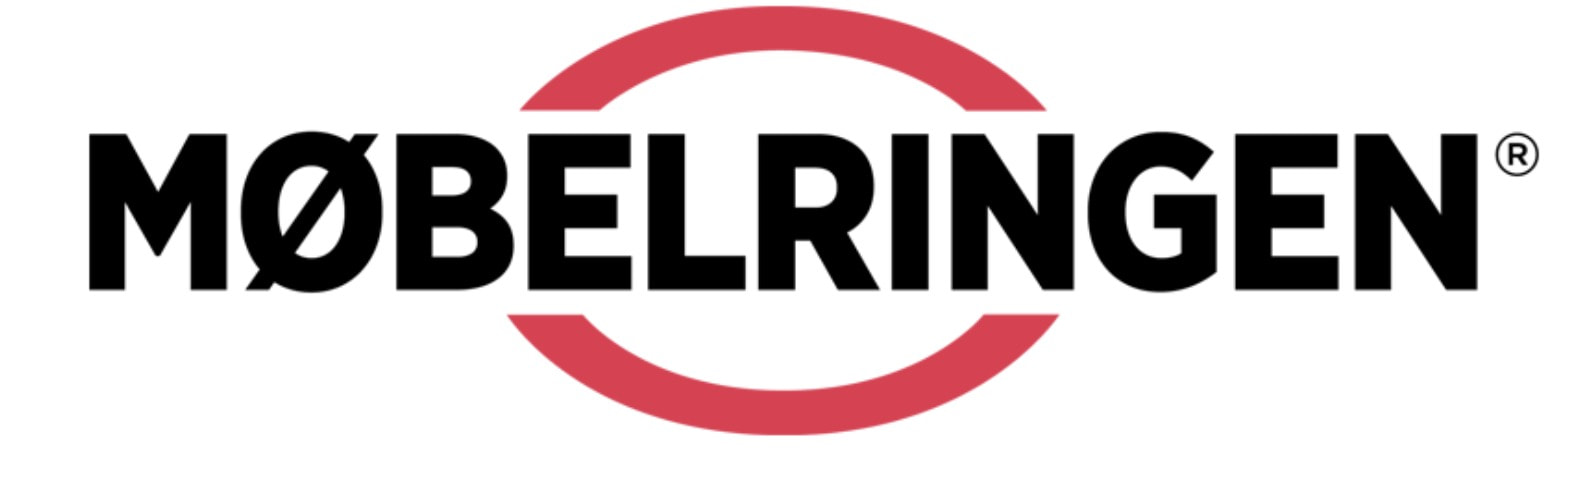 Font, Logo, Text